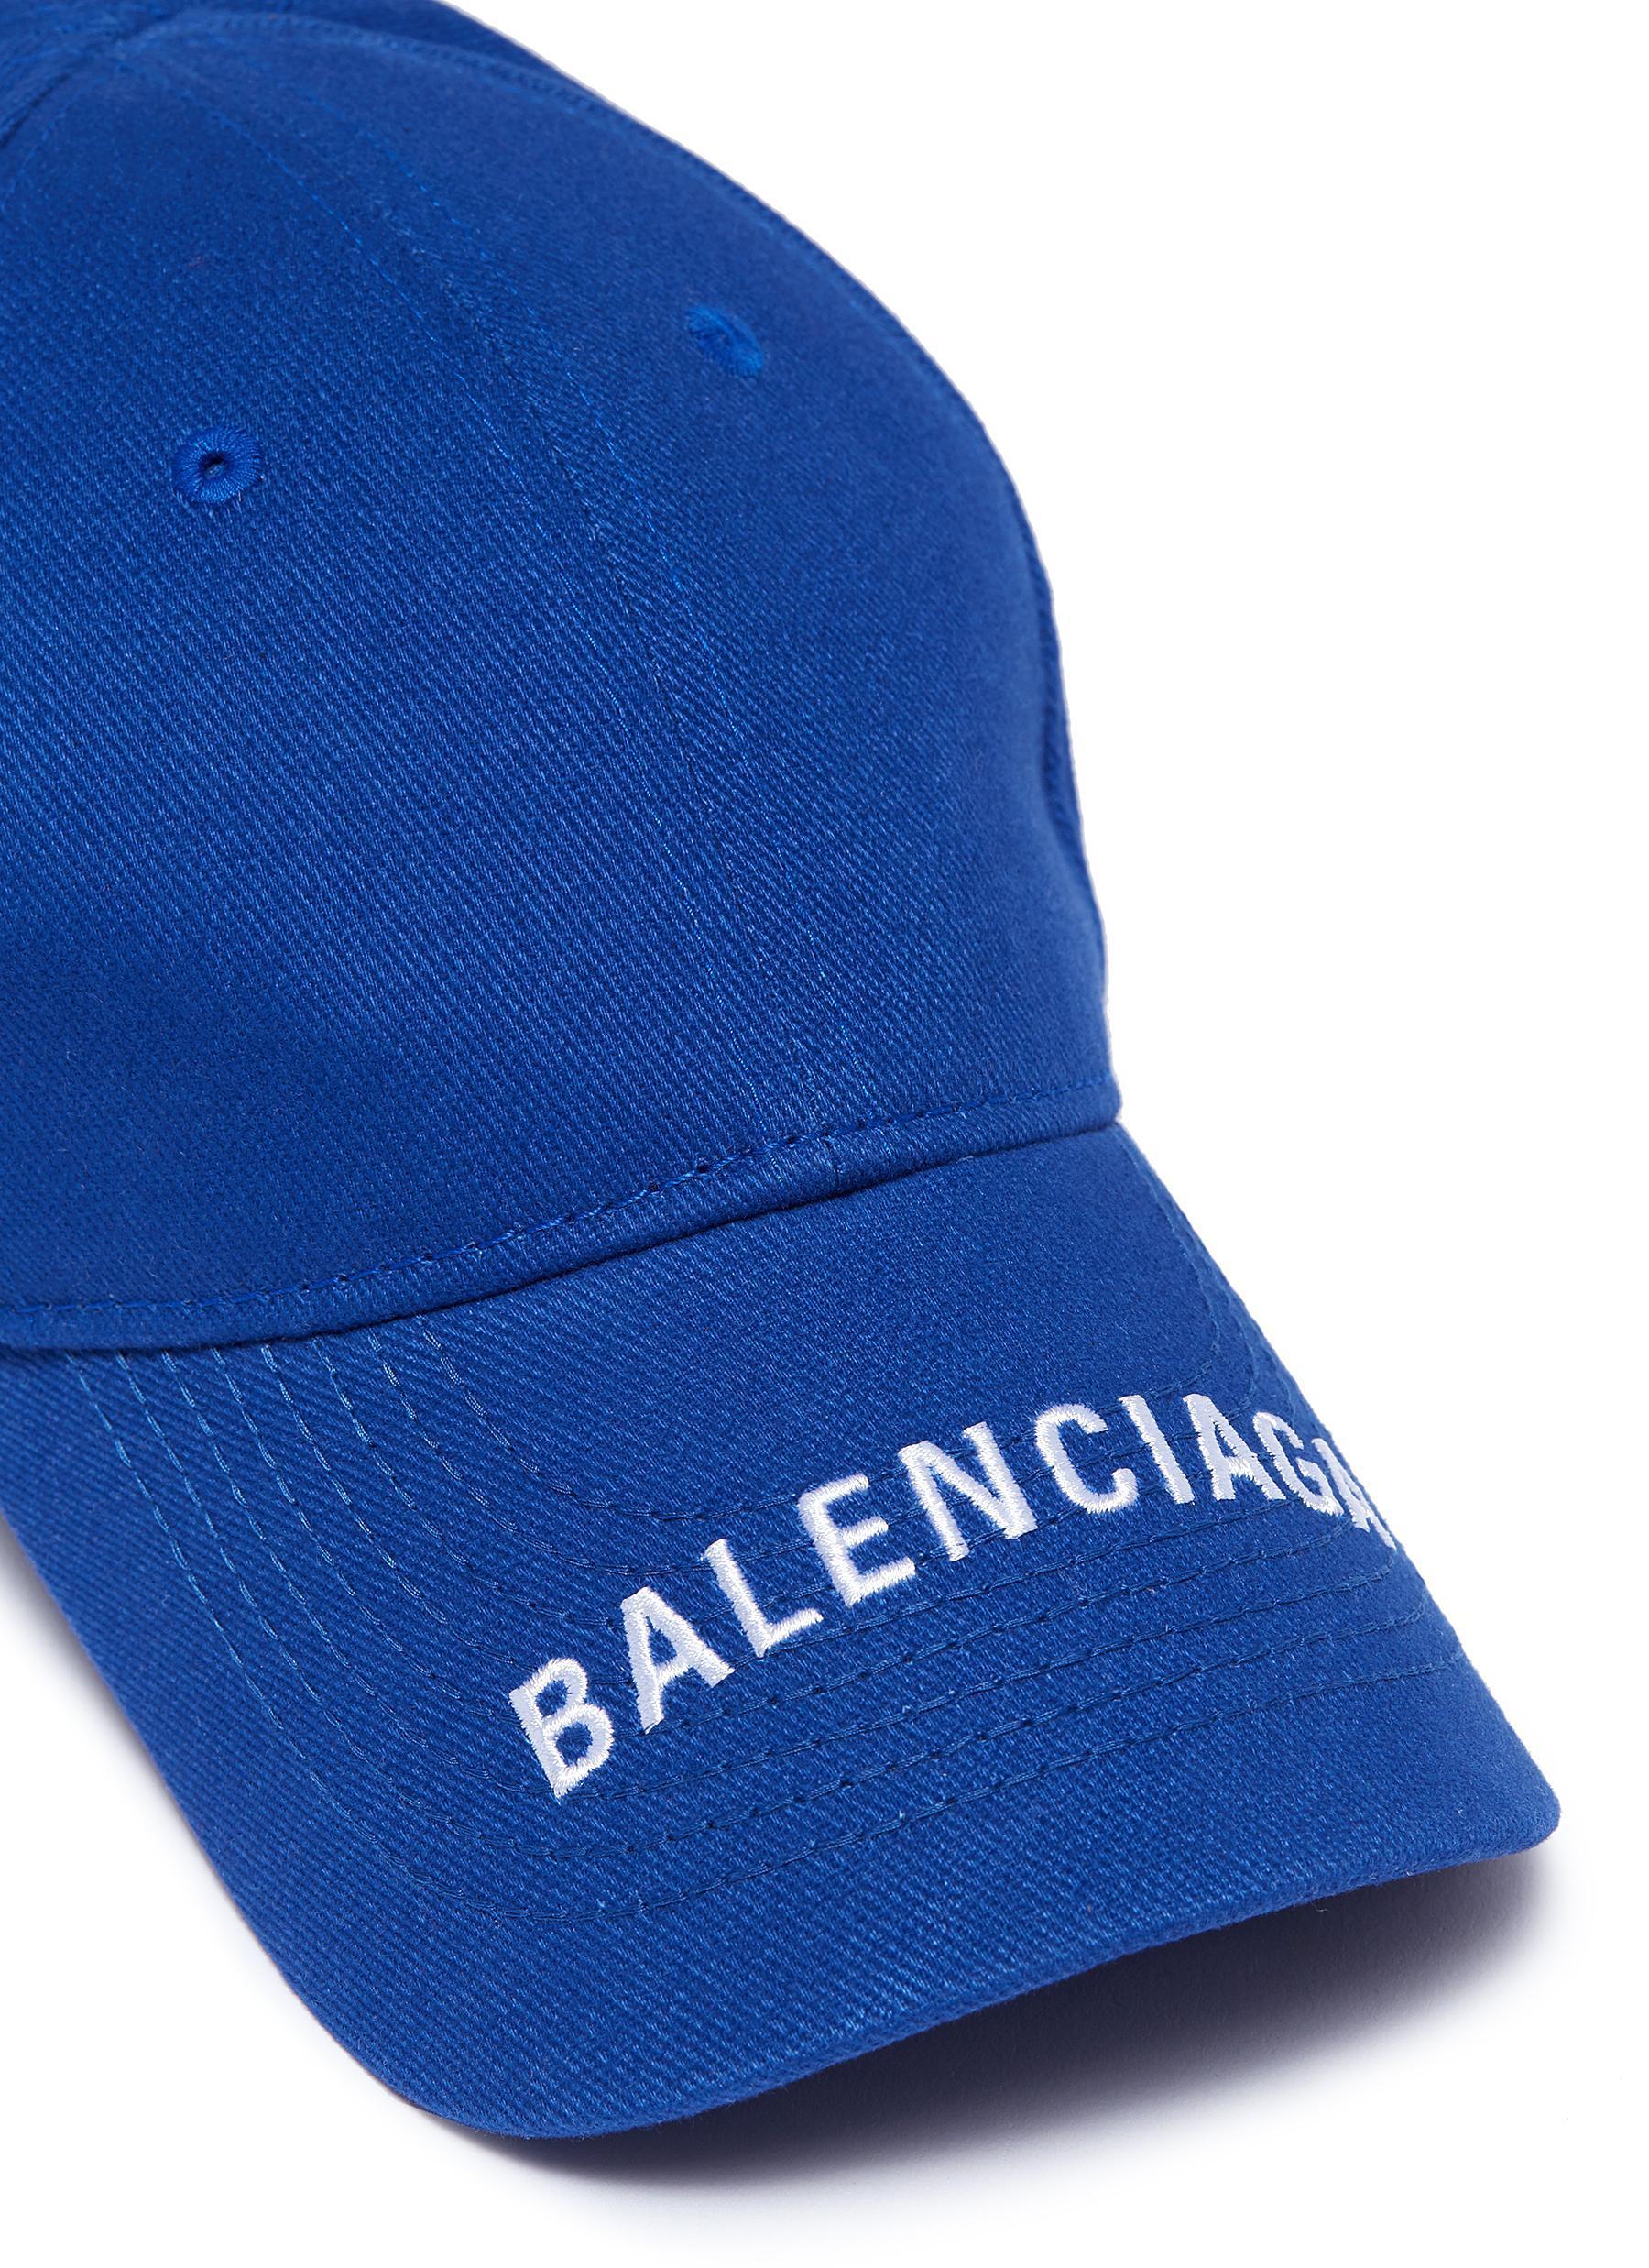 af3dadbf934 Lyst - Balenciaga  everyday  Logo Embroidered Visor Baseball Cap in ...